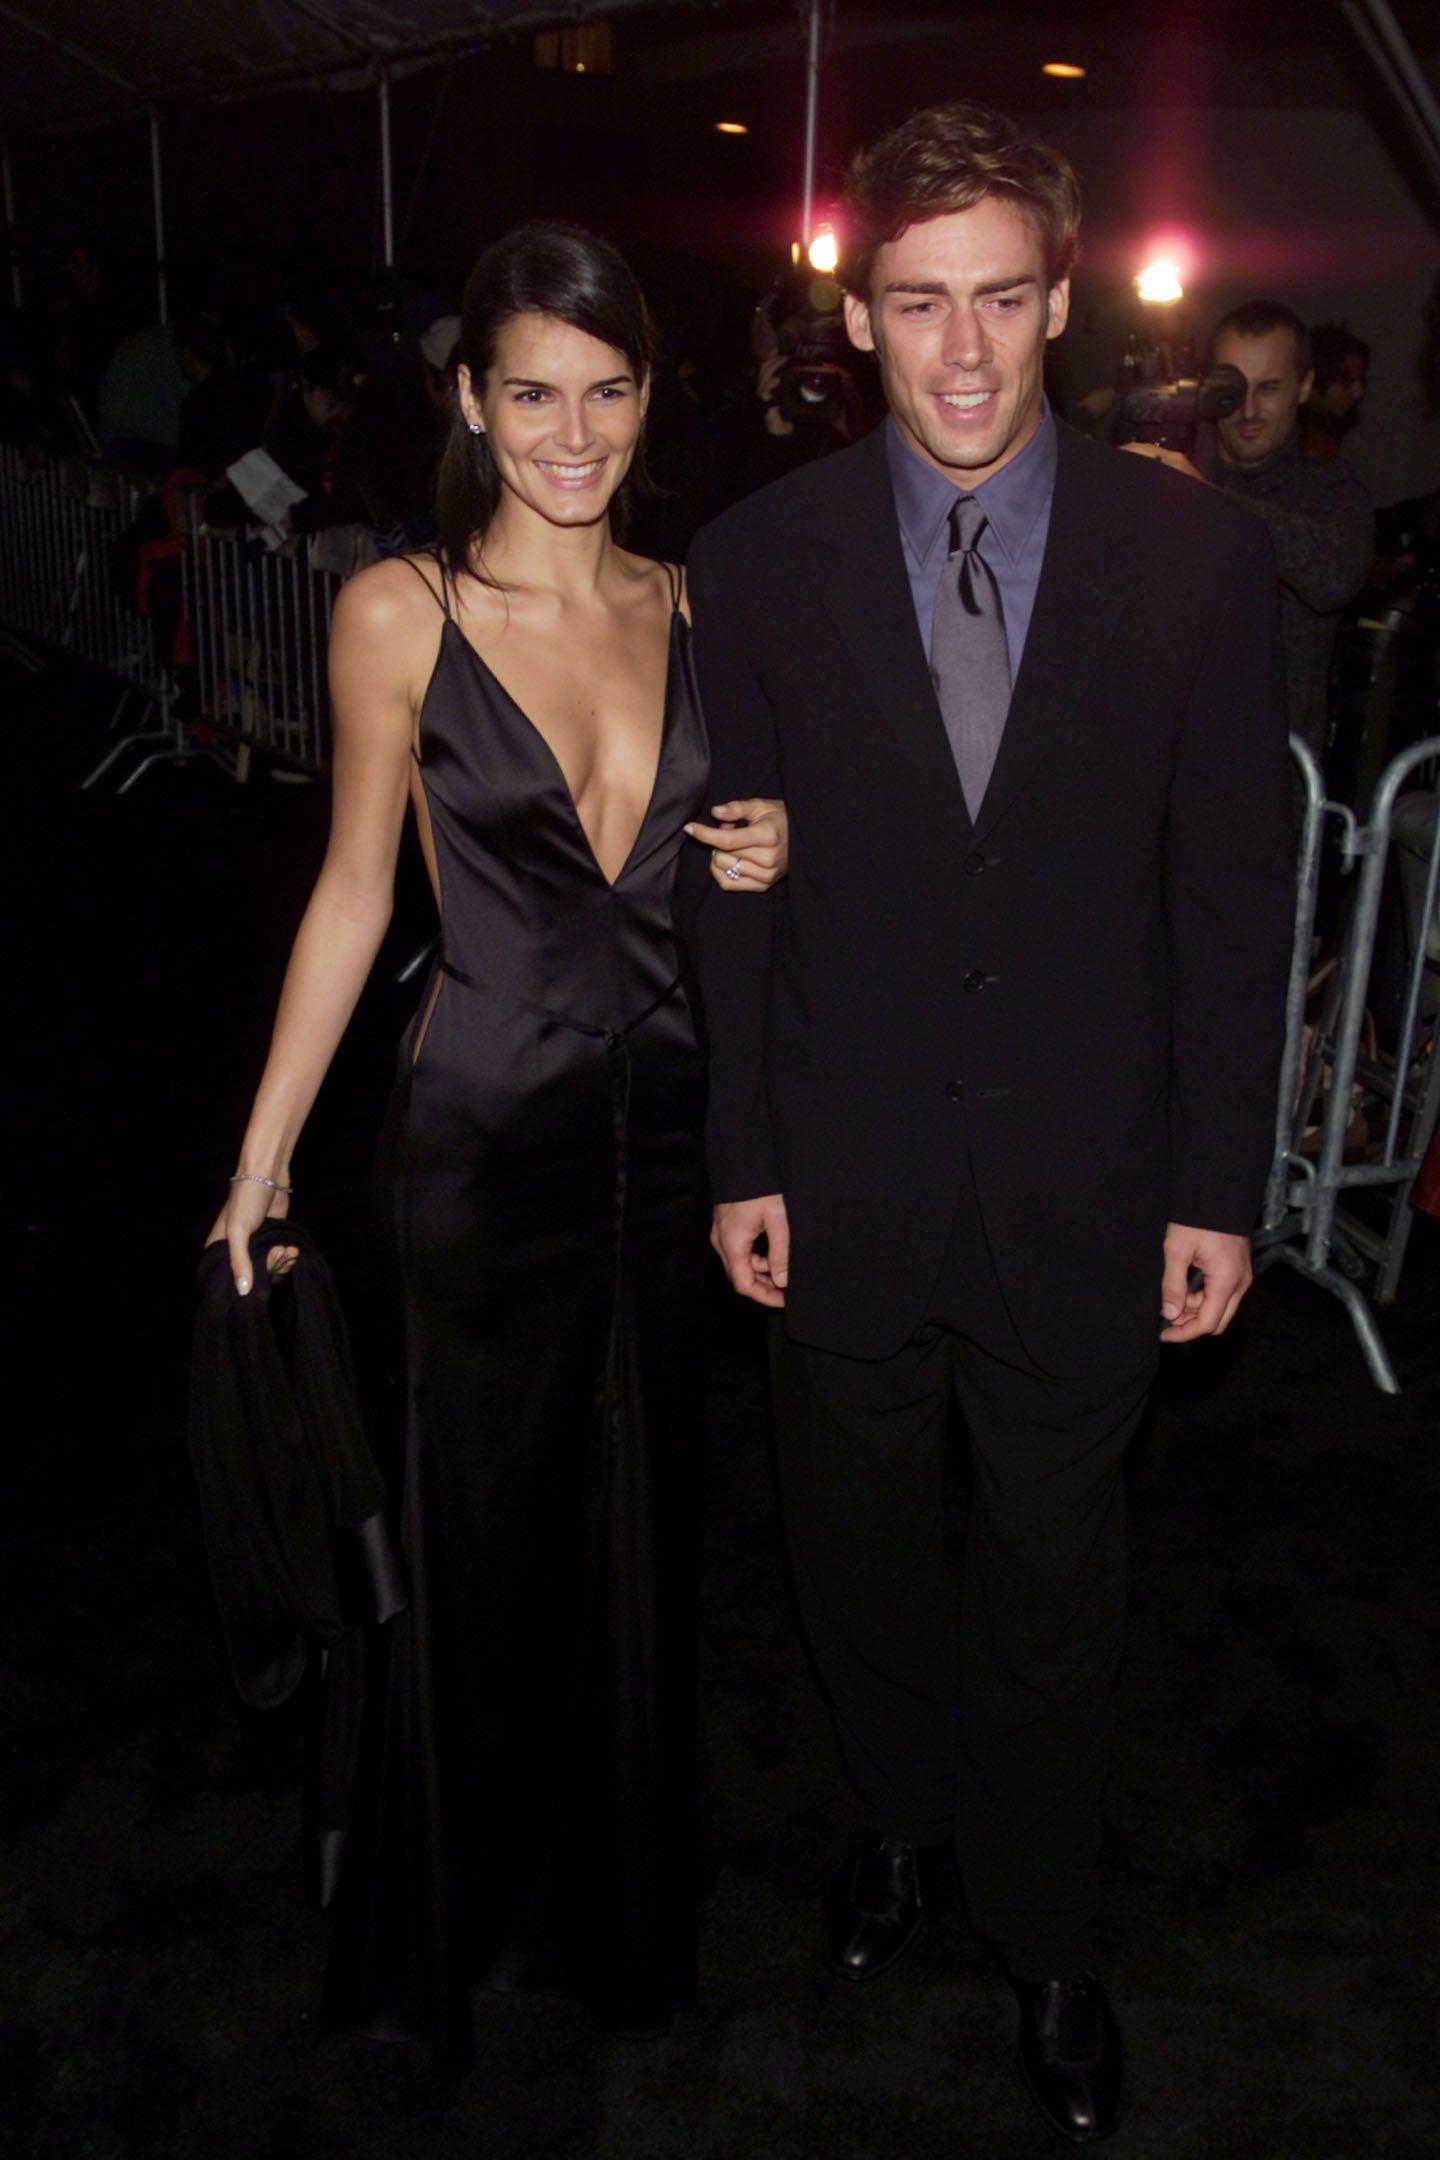 Angie Harmon & Jason Seyhorn